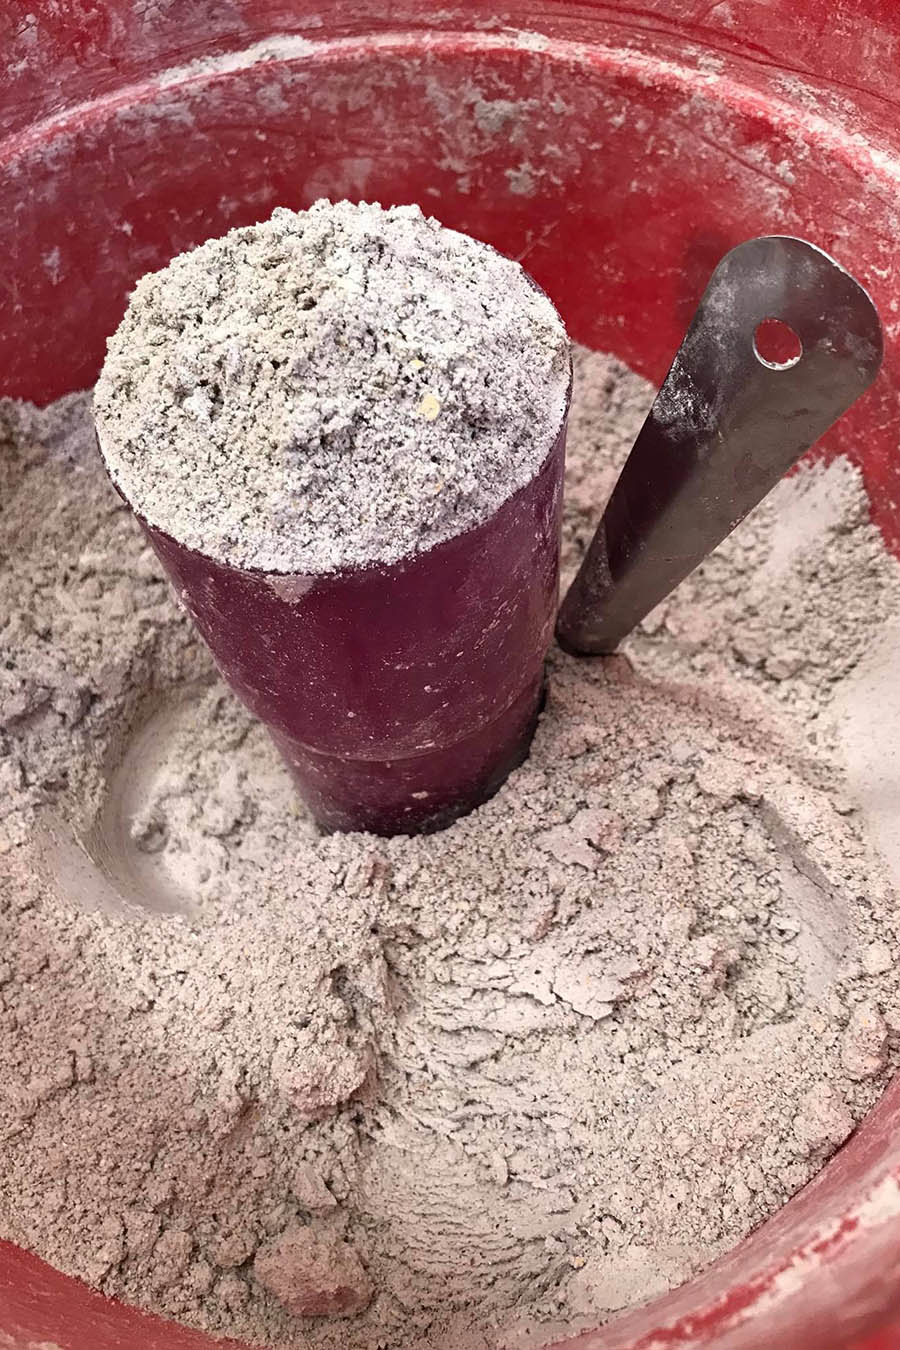 harina de maiz harina natural corn flour harina de maiz nixtamalizado pinole harina de maiz tostado